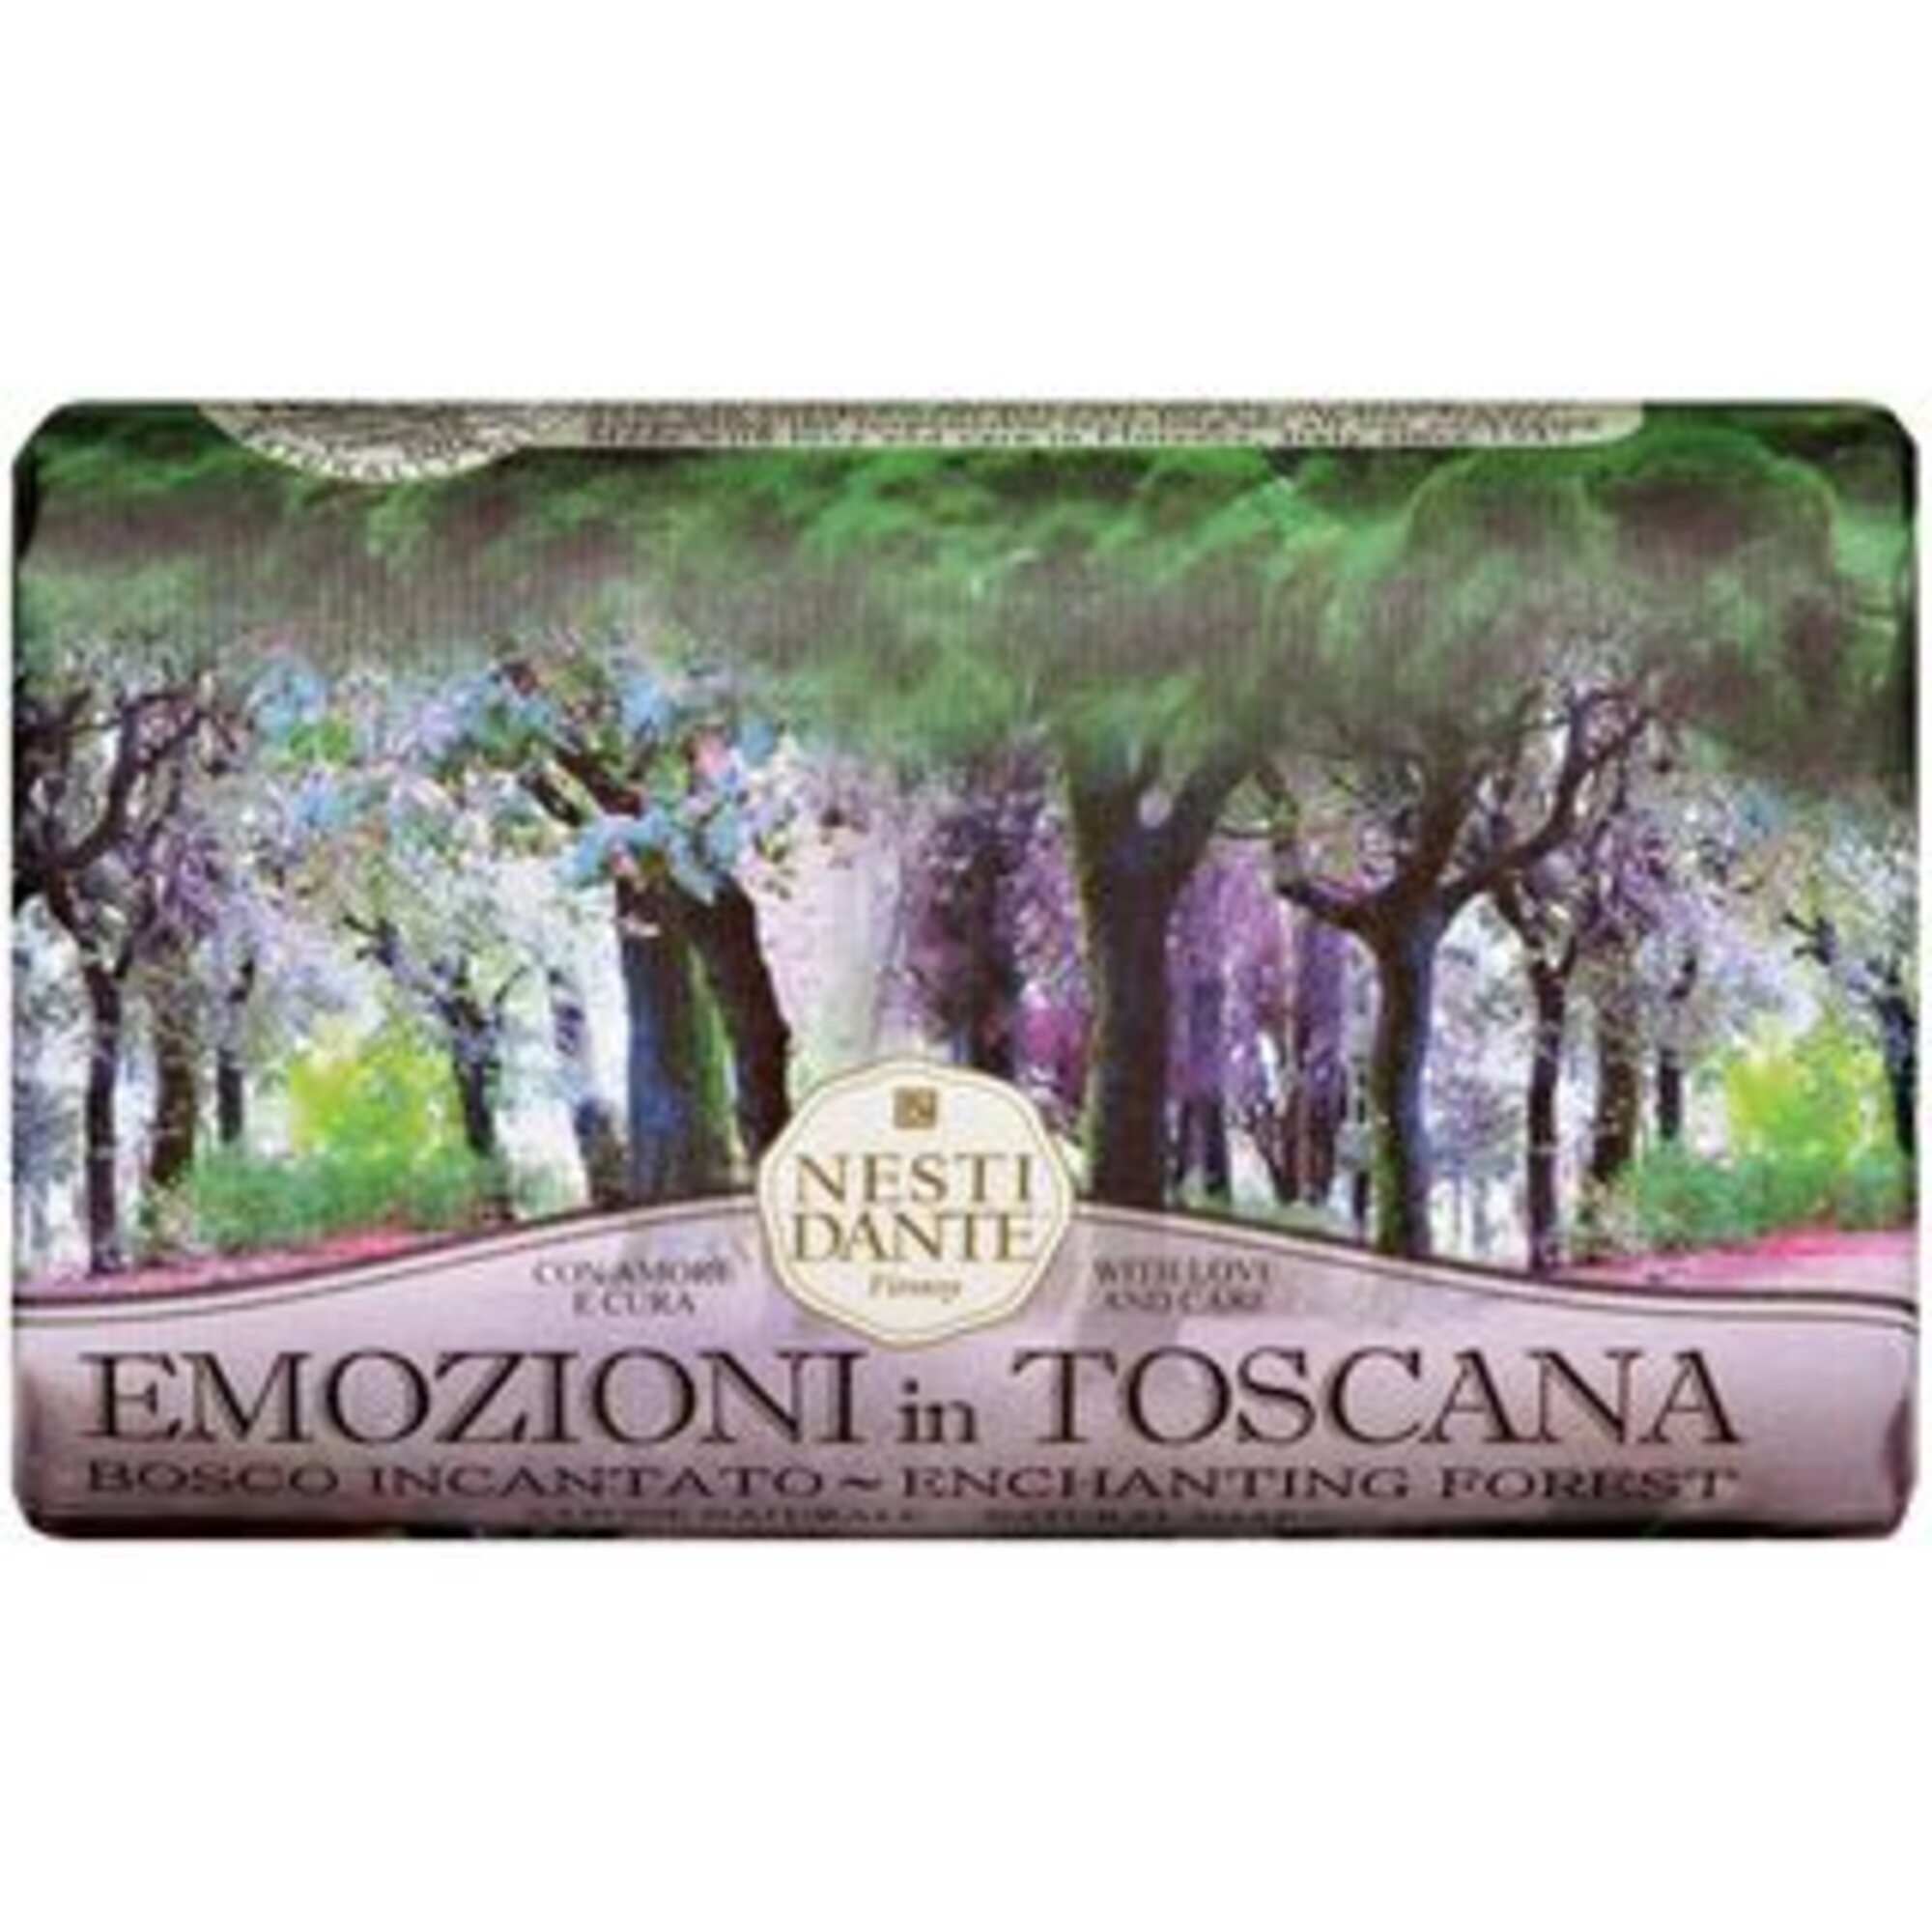 Sabonete Emozioni In Toscana Floresta Encantada 250g Nesti Dante